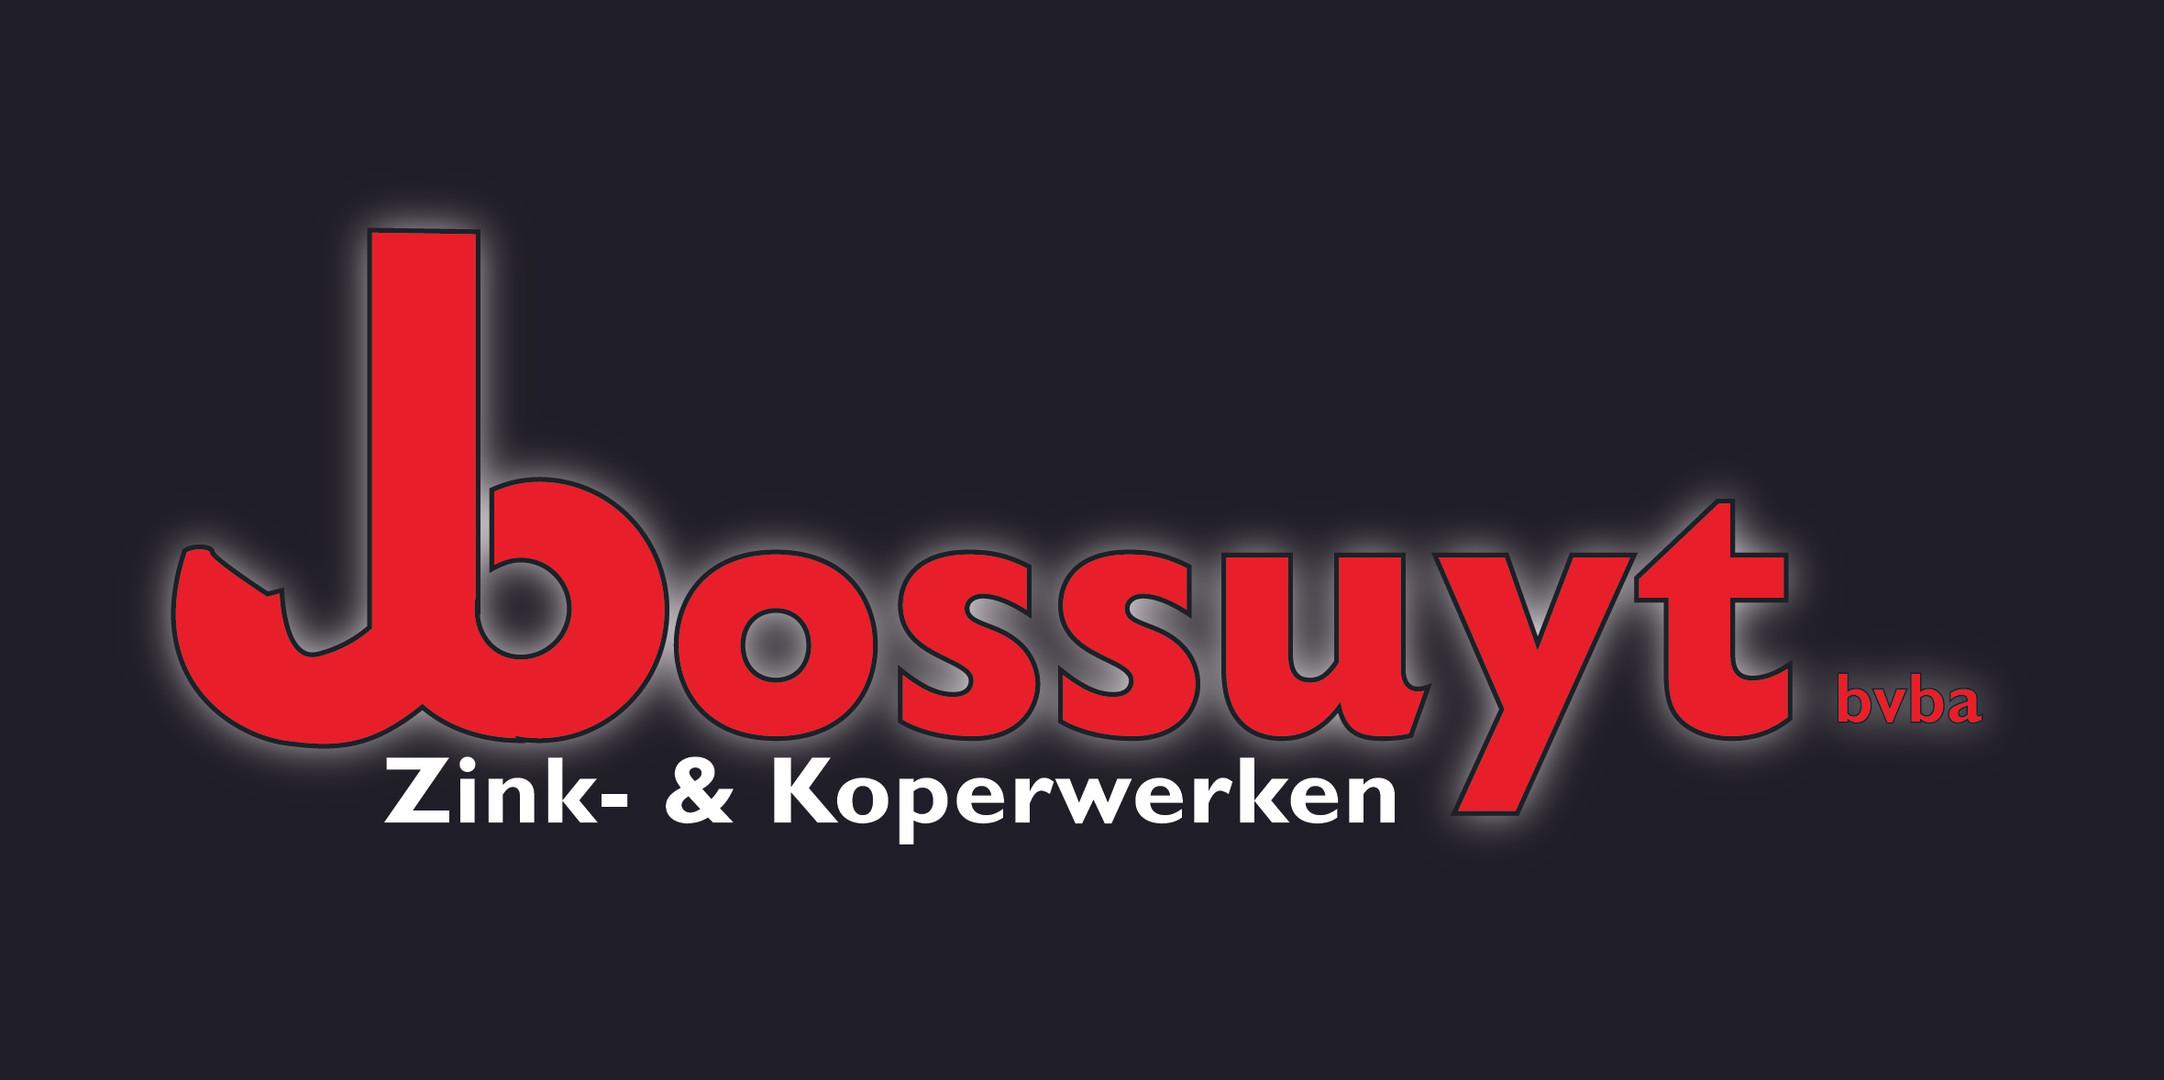 Bossuyt_zink&koperwerken2019.jpg